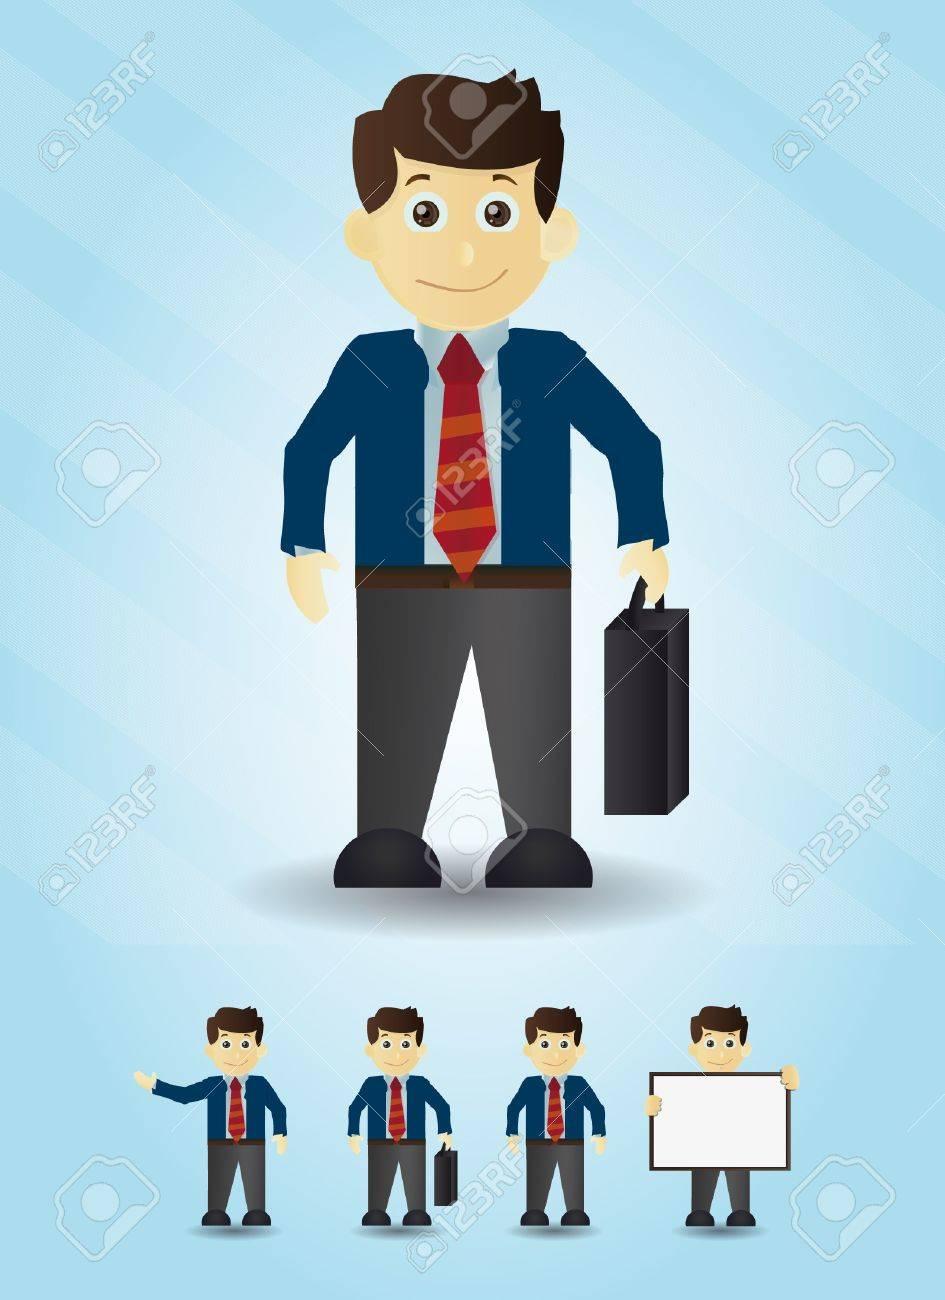 Businessman cartoon office illustrations Stock Vector - 13435700